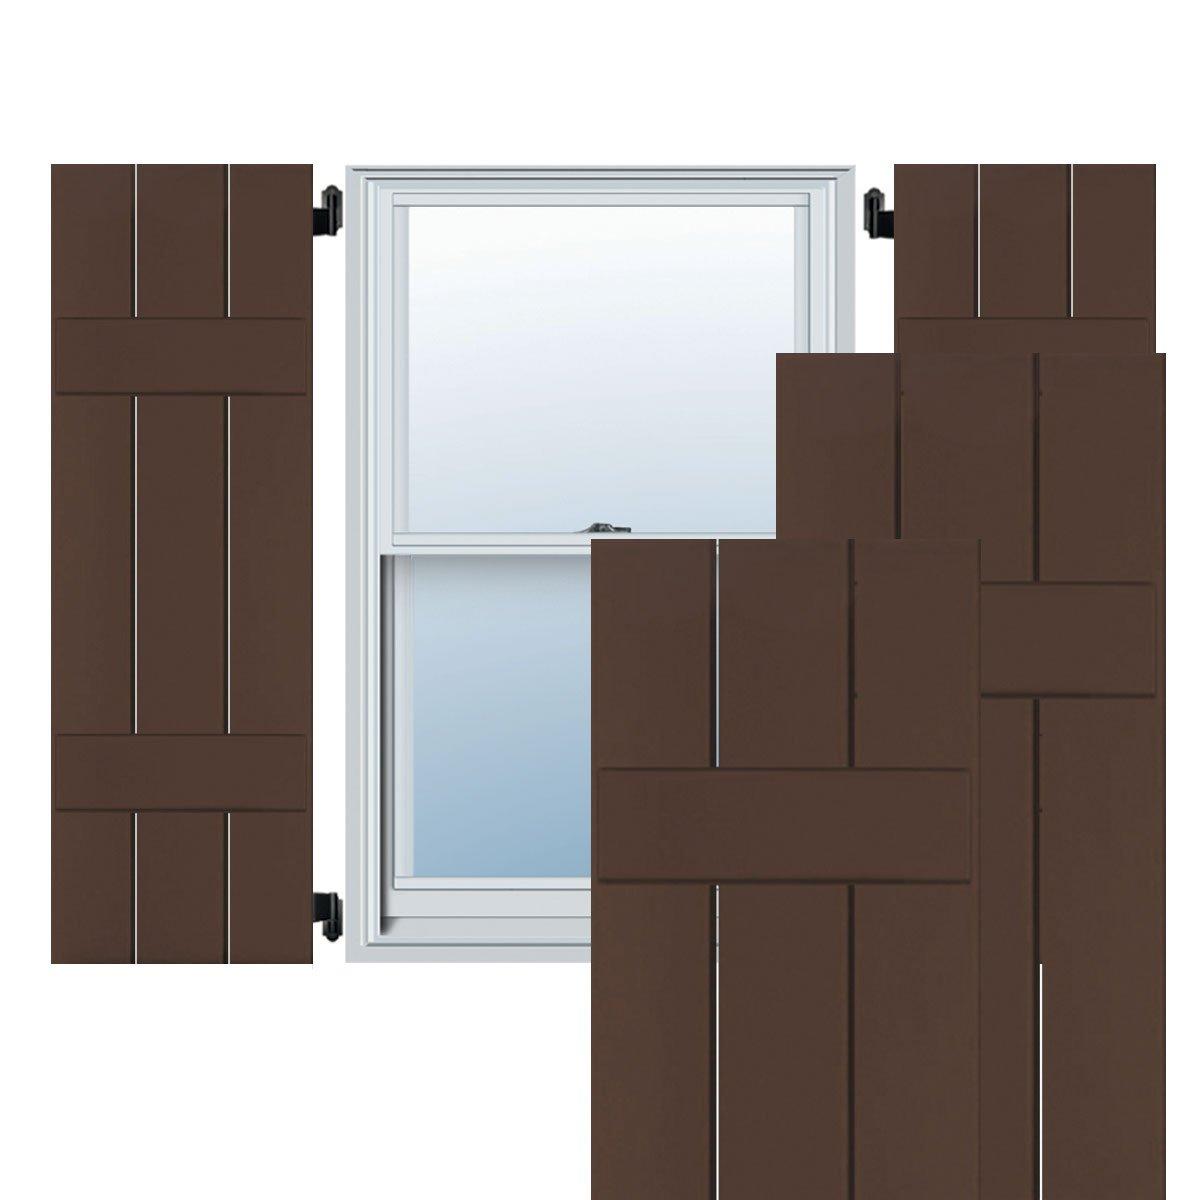 Tudor Brown 10 1//2W x 35H 10 1//2W x 35H Per Pair Ekena Millwork EB0110500X035000CTB Exterior Composite Wood Three Board Two Batten Board-n-Batten Shutters with Installation Brackets